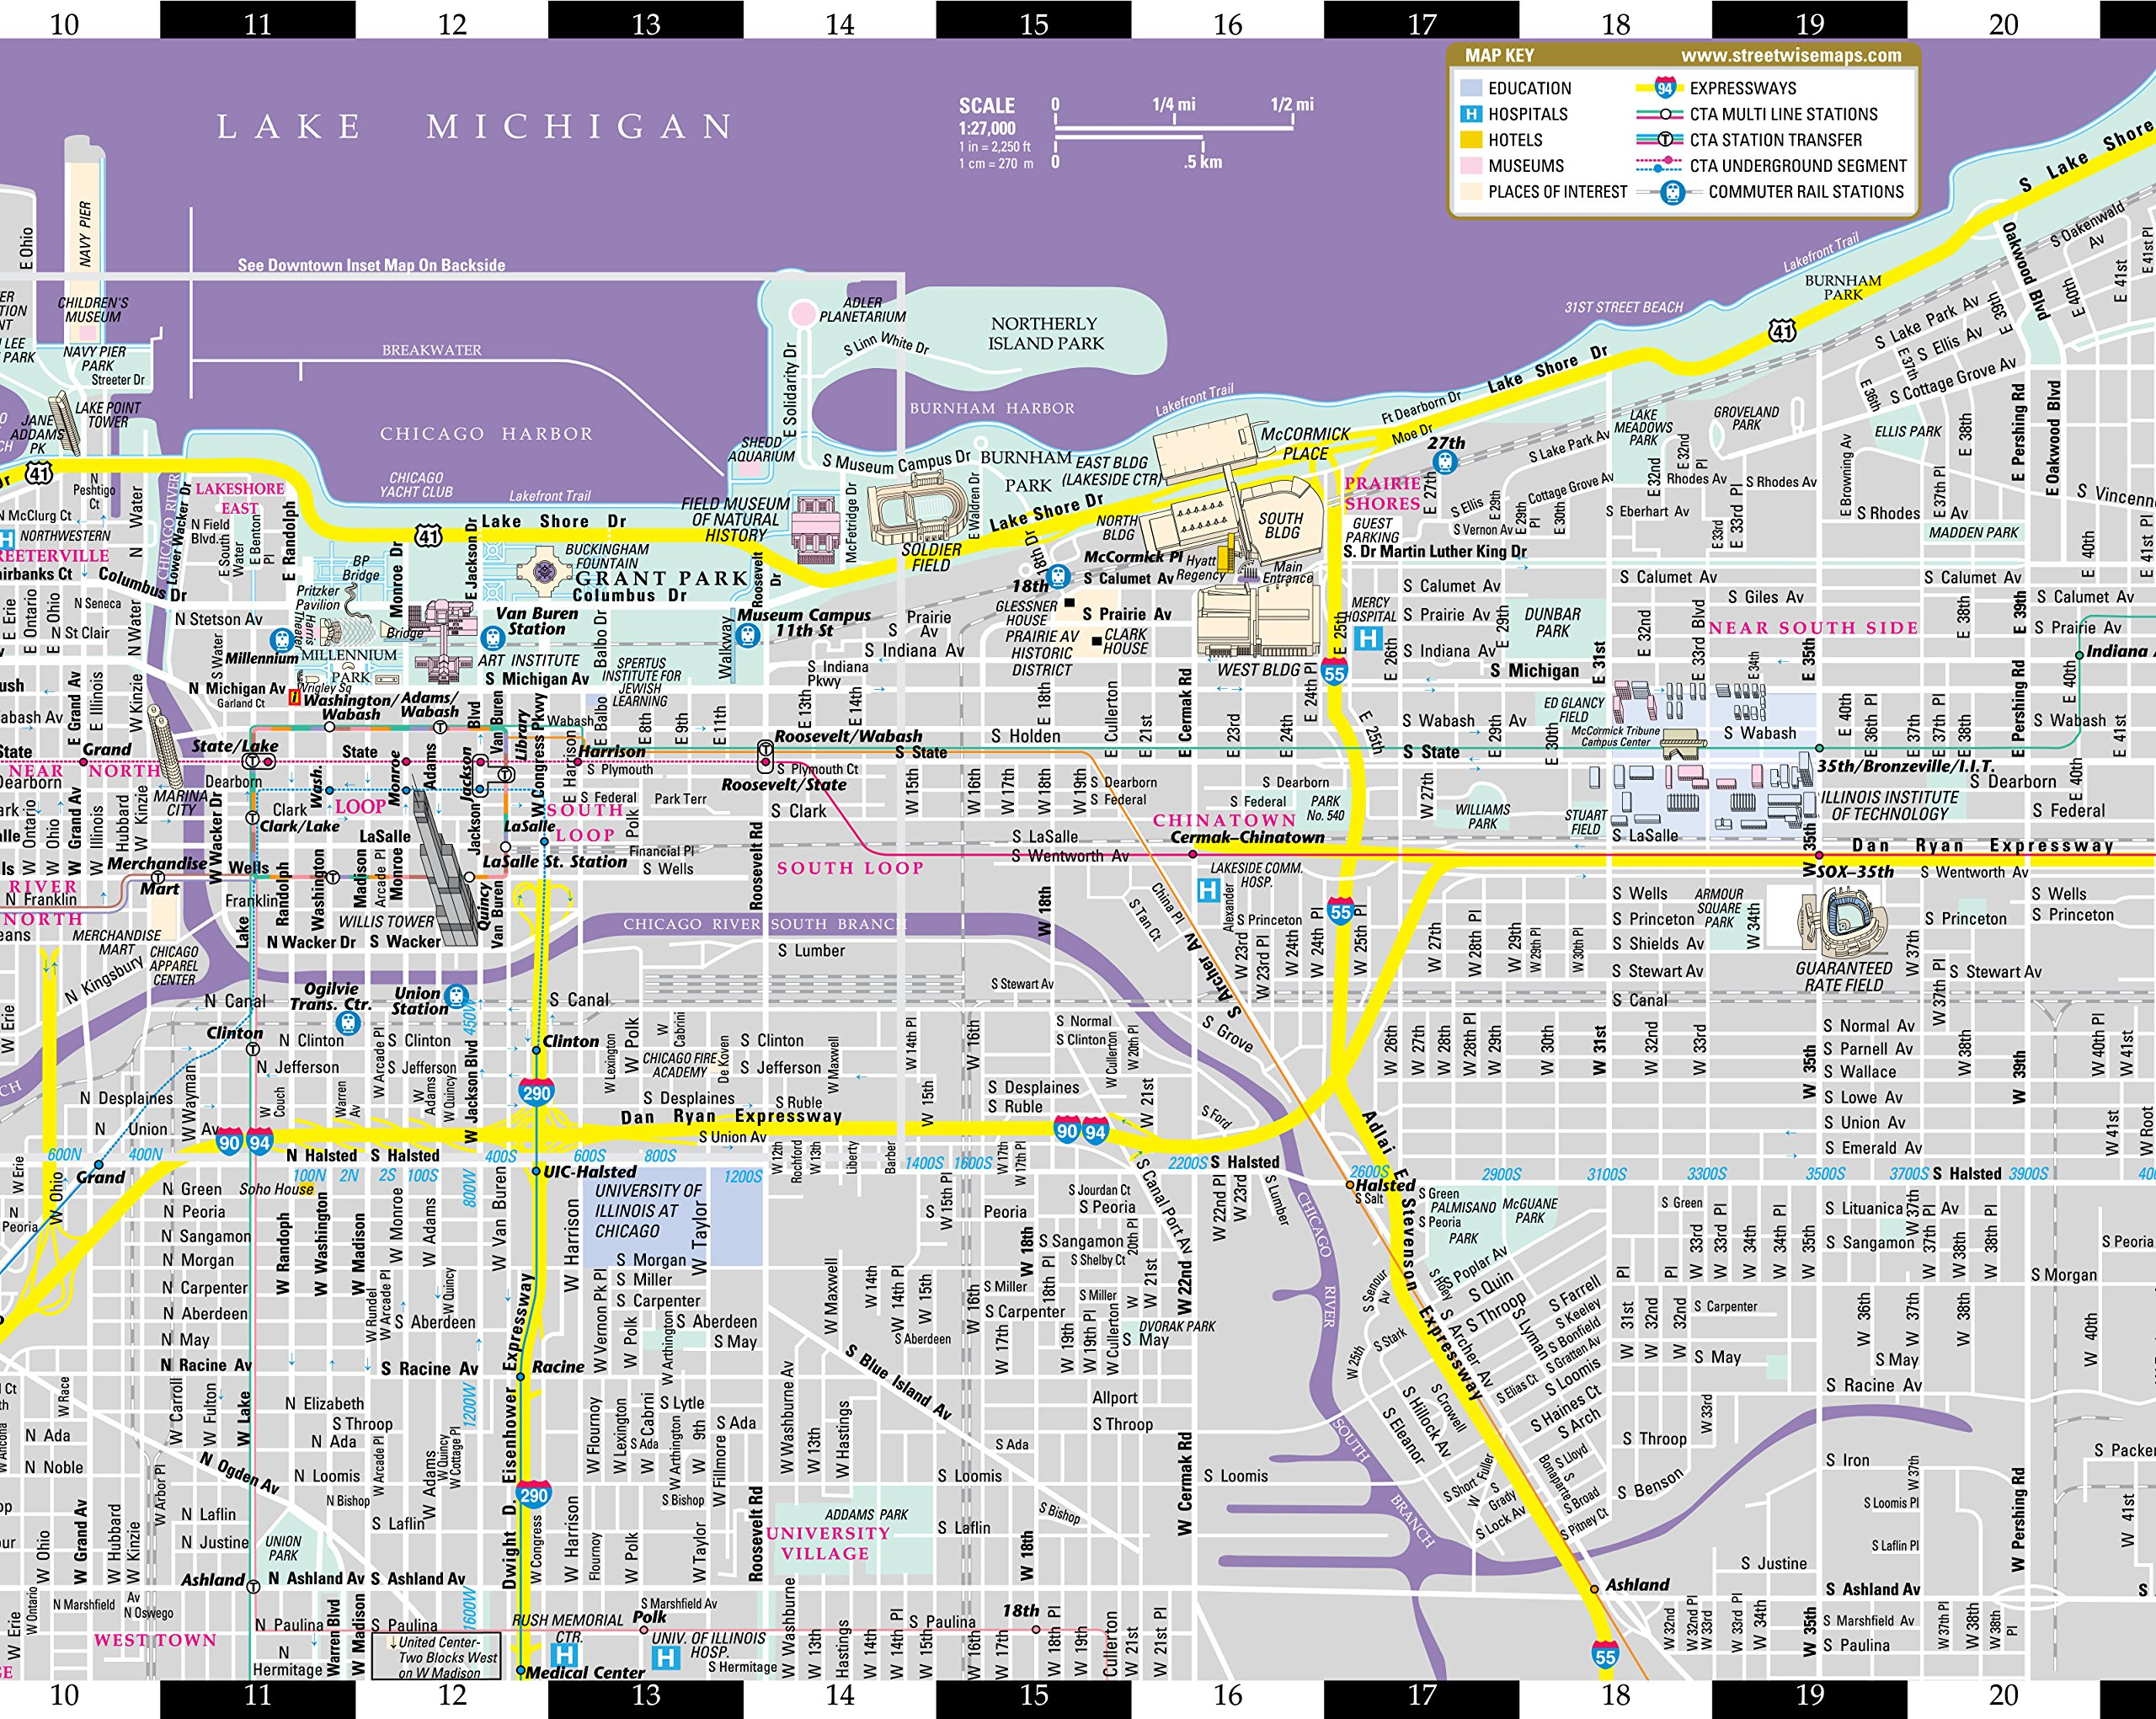 Streetwise Chicago Map.Streetwise Chicago Map Laminated City Center Street Map Of Chicago